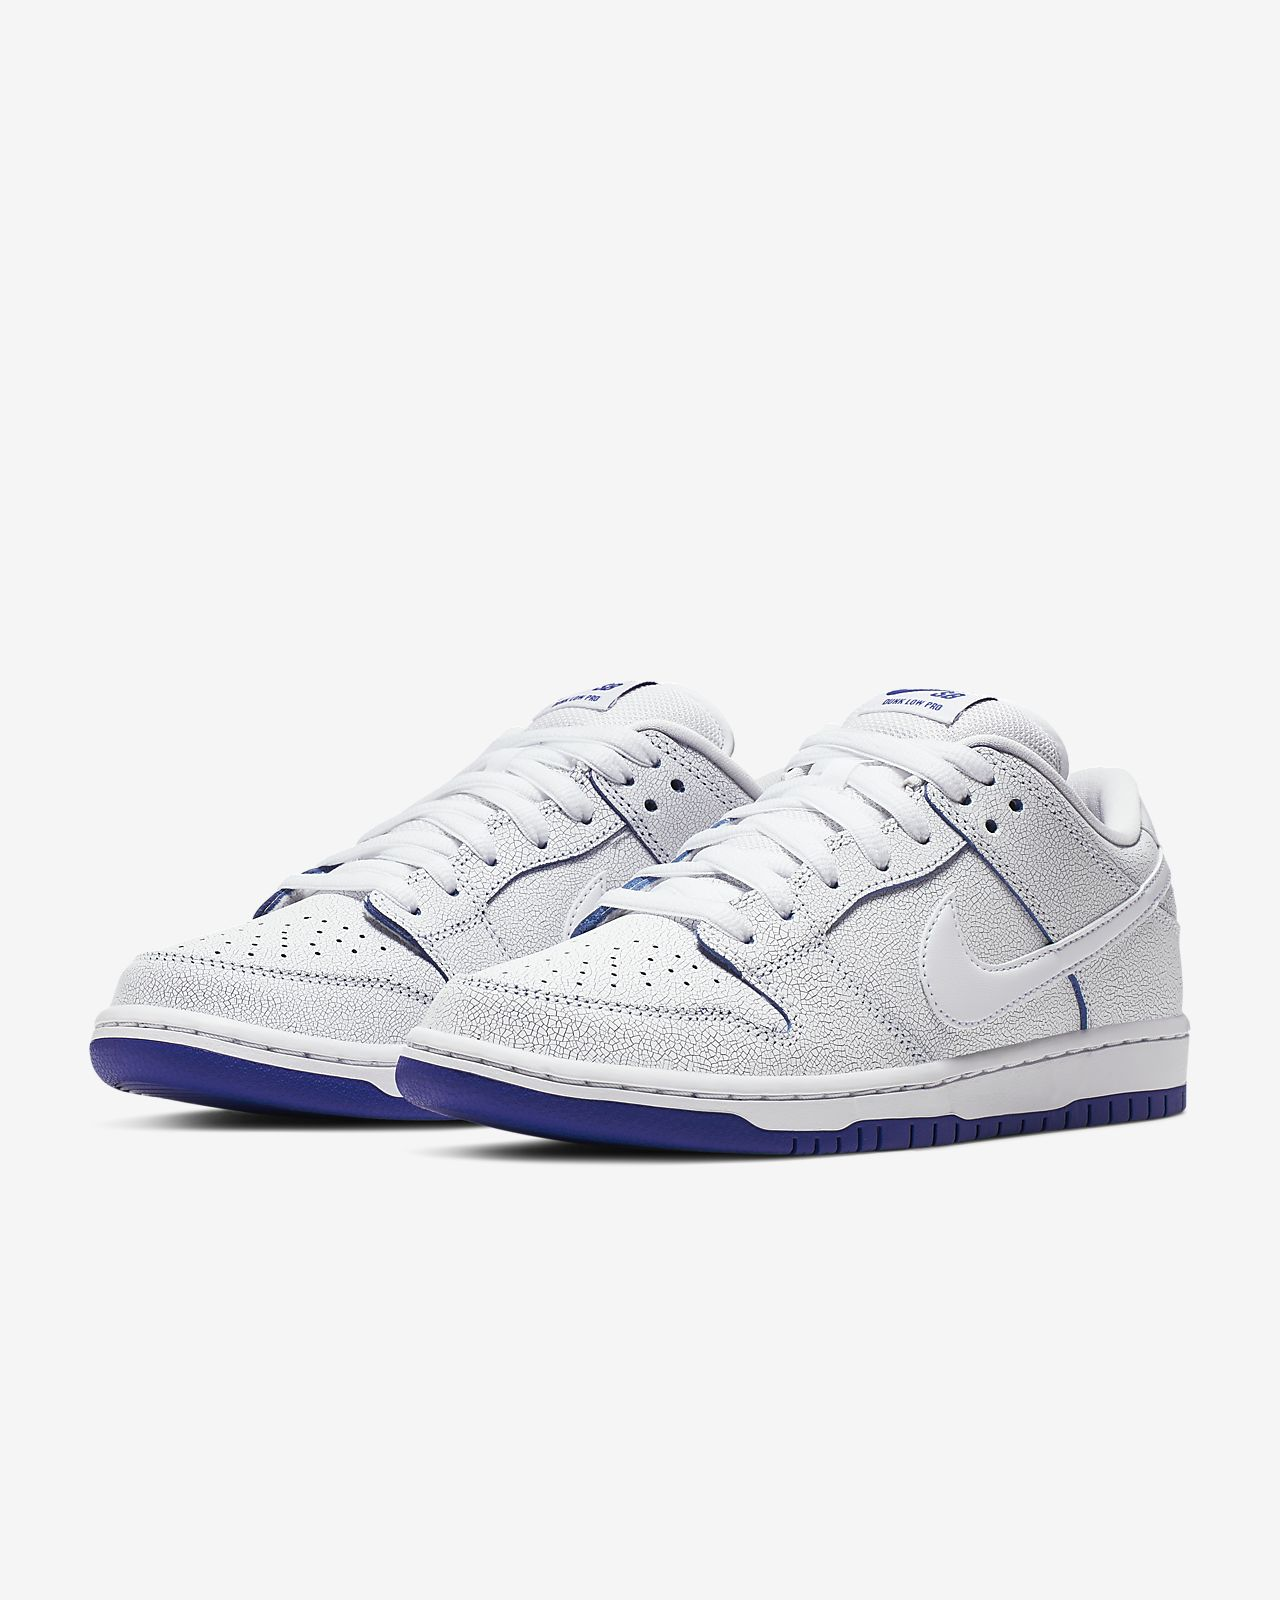 buy online d2bdc 6d099 Nike SB Dunk Low Pro Premium Skate Shoe